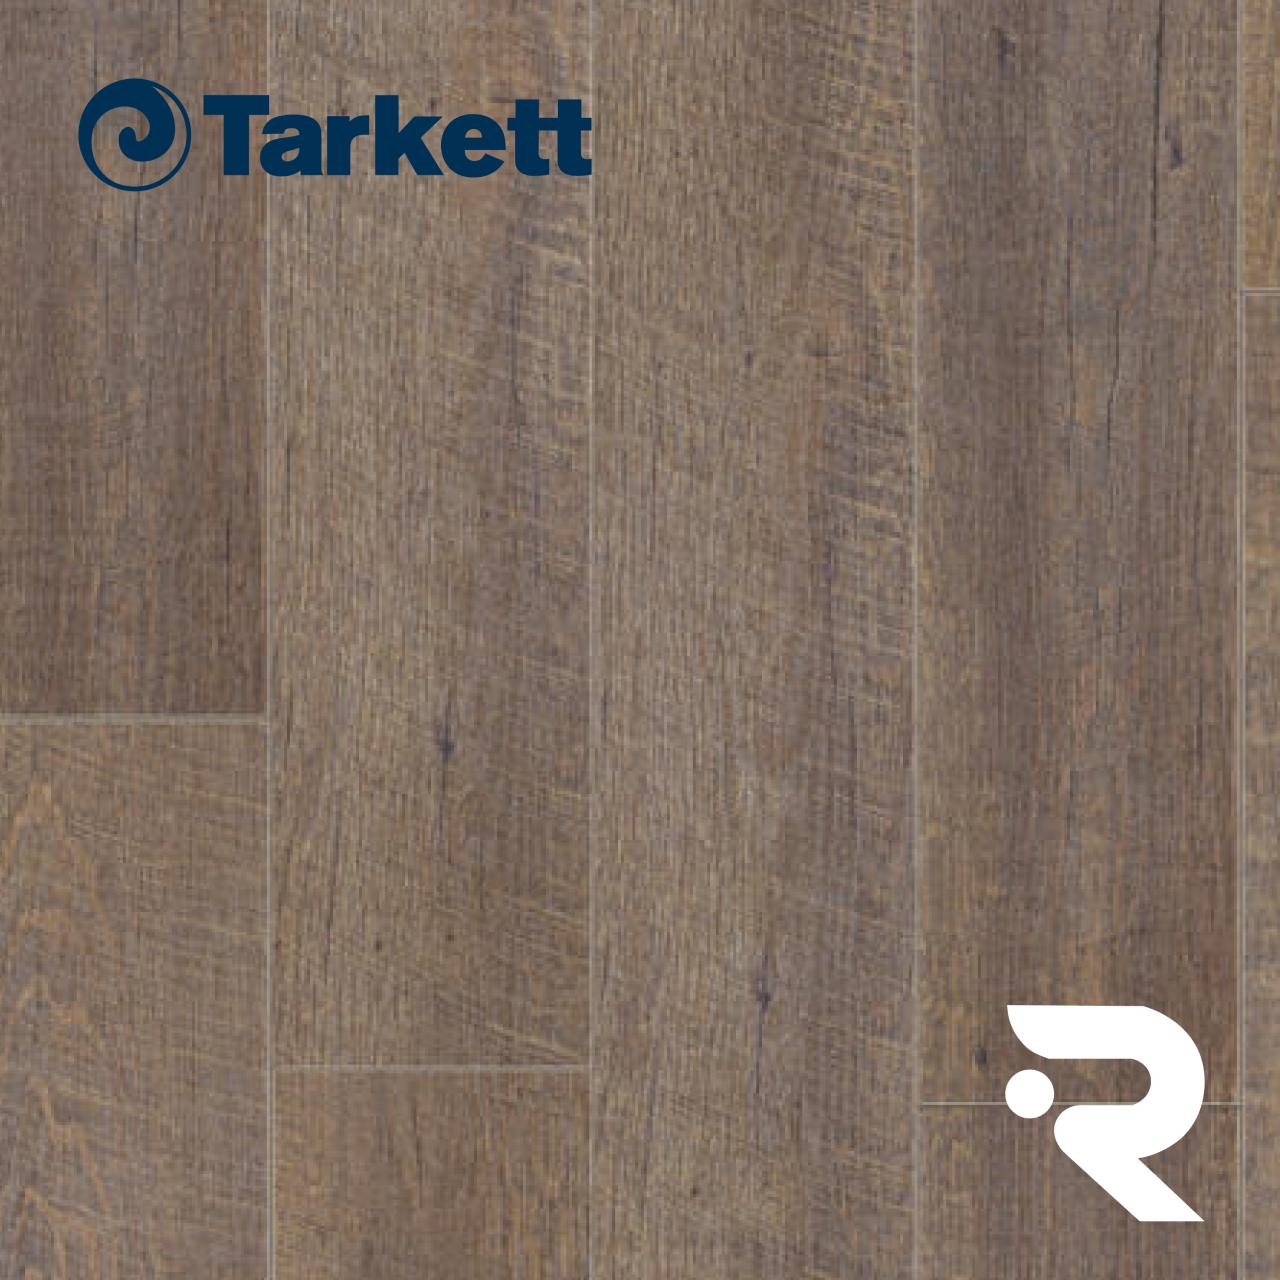 🌳 ПВХ плитка Tarkett | LOUNGE - BUDDHA | Art Vinyl | 914 x 152 мм